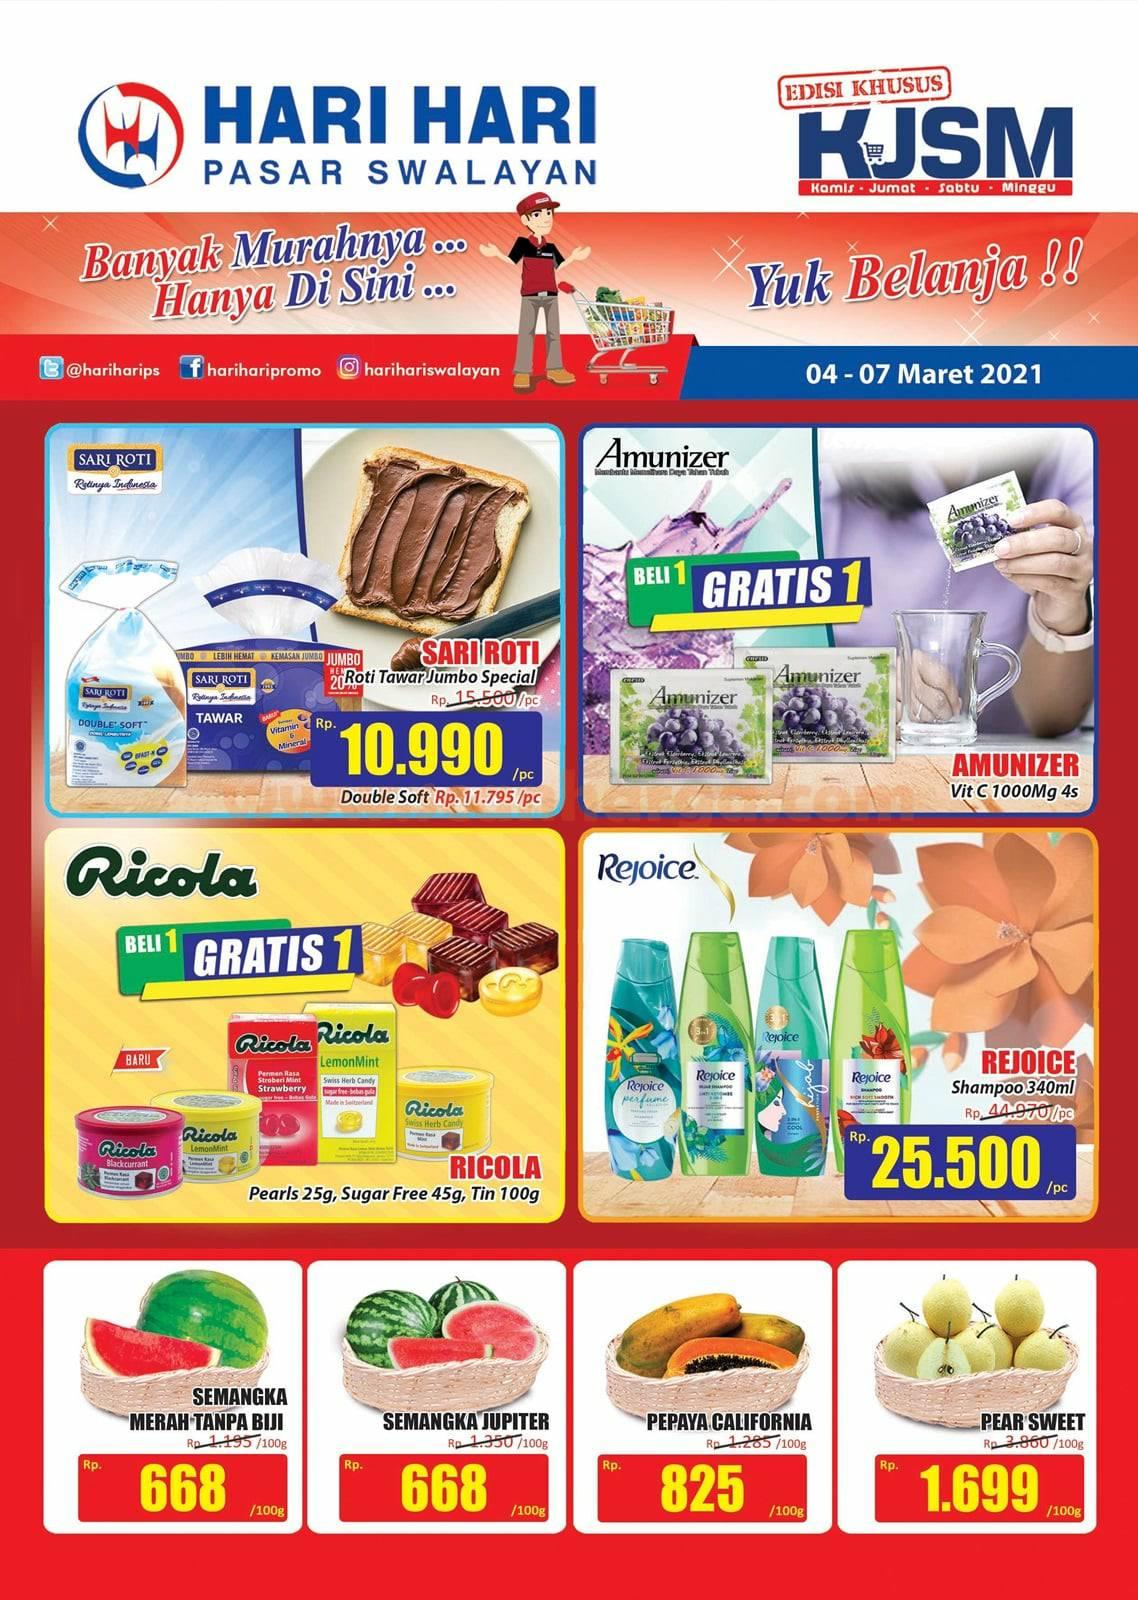 Katalog Promo JSM Hari Hari Swalayan Weekend 4 - 7 Maret 2021 1